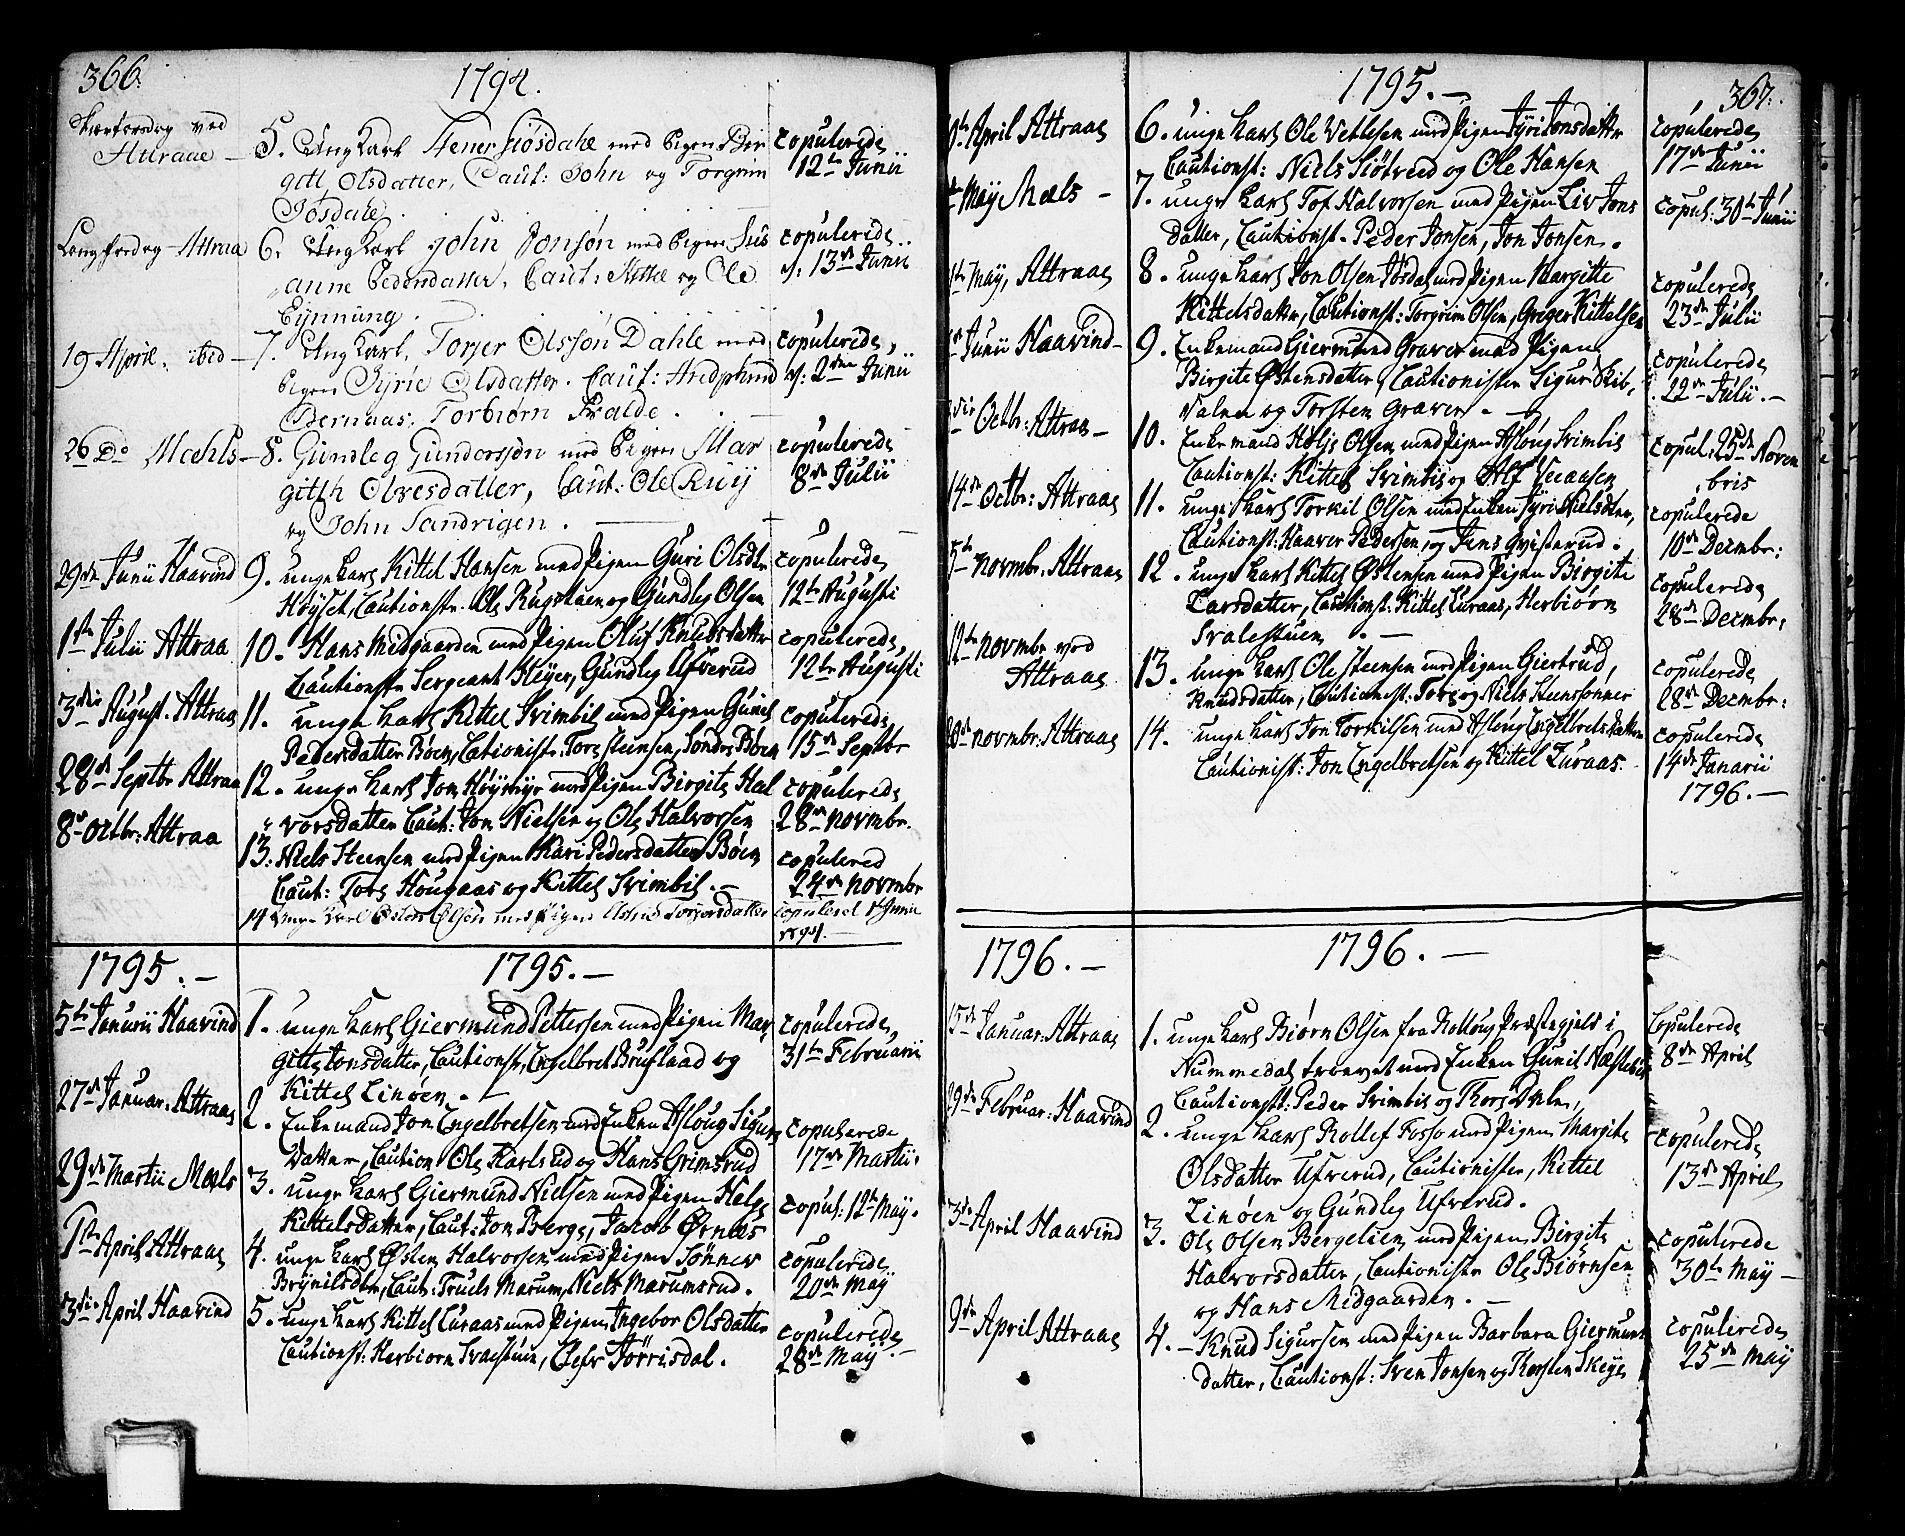 SAKO, Tinn kirkebøker, F/Fa/L0002: Ministerialbok nr. I 2, 1757-1810, s. 366-367